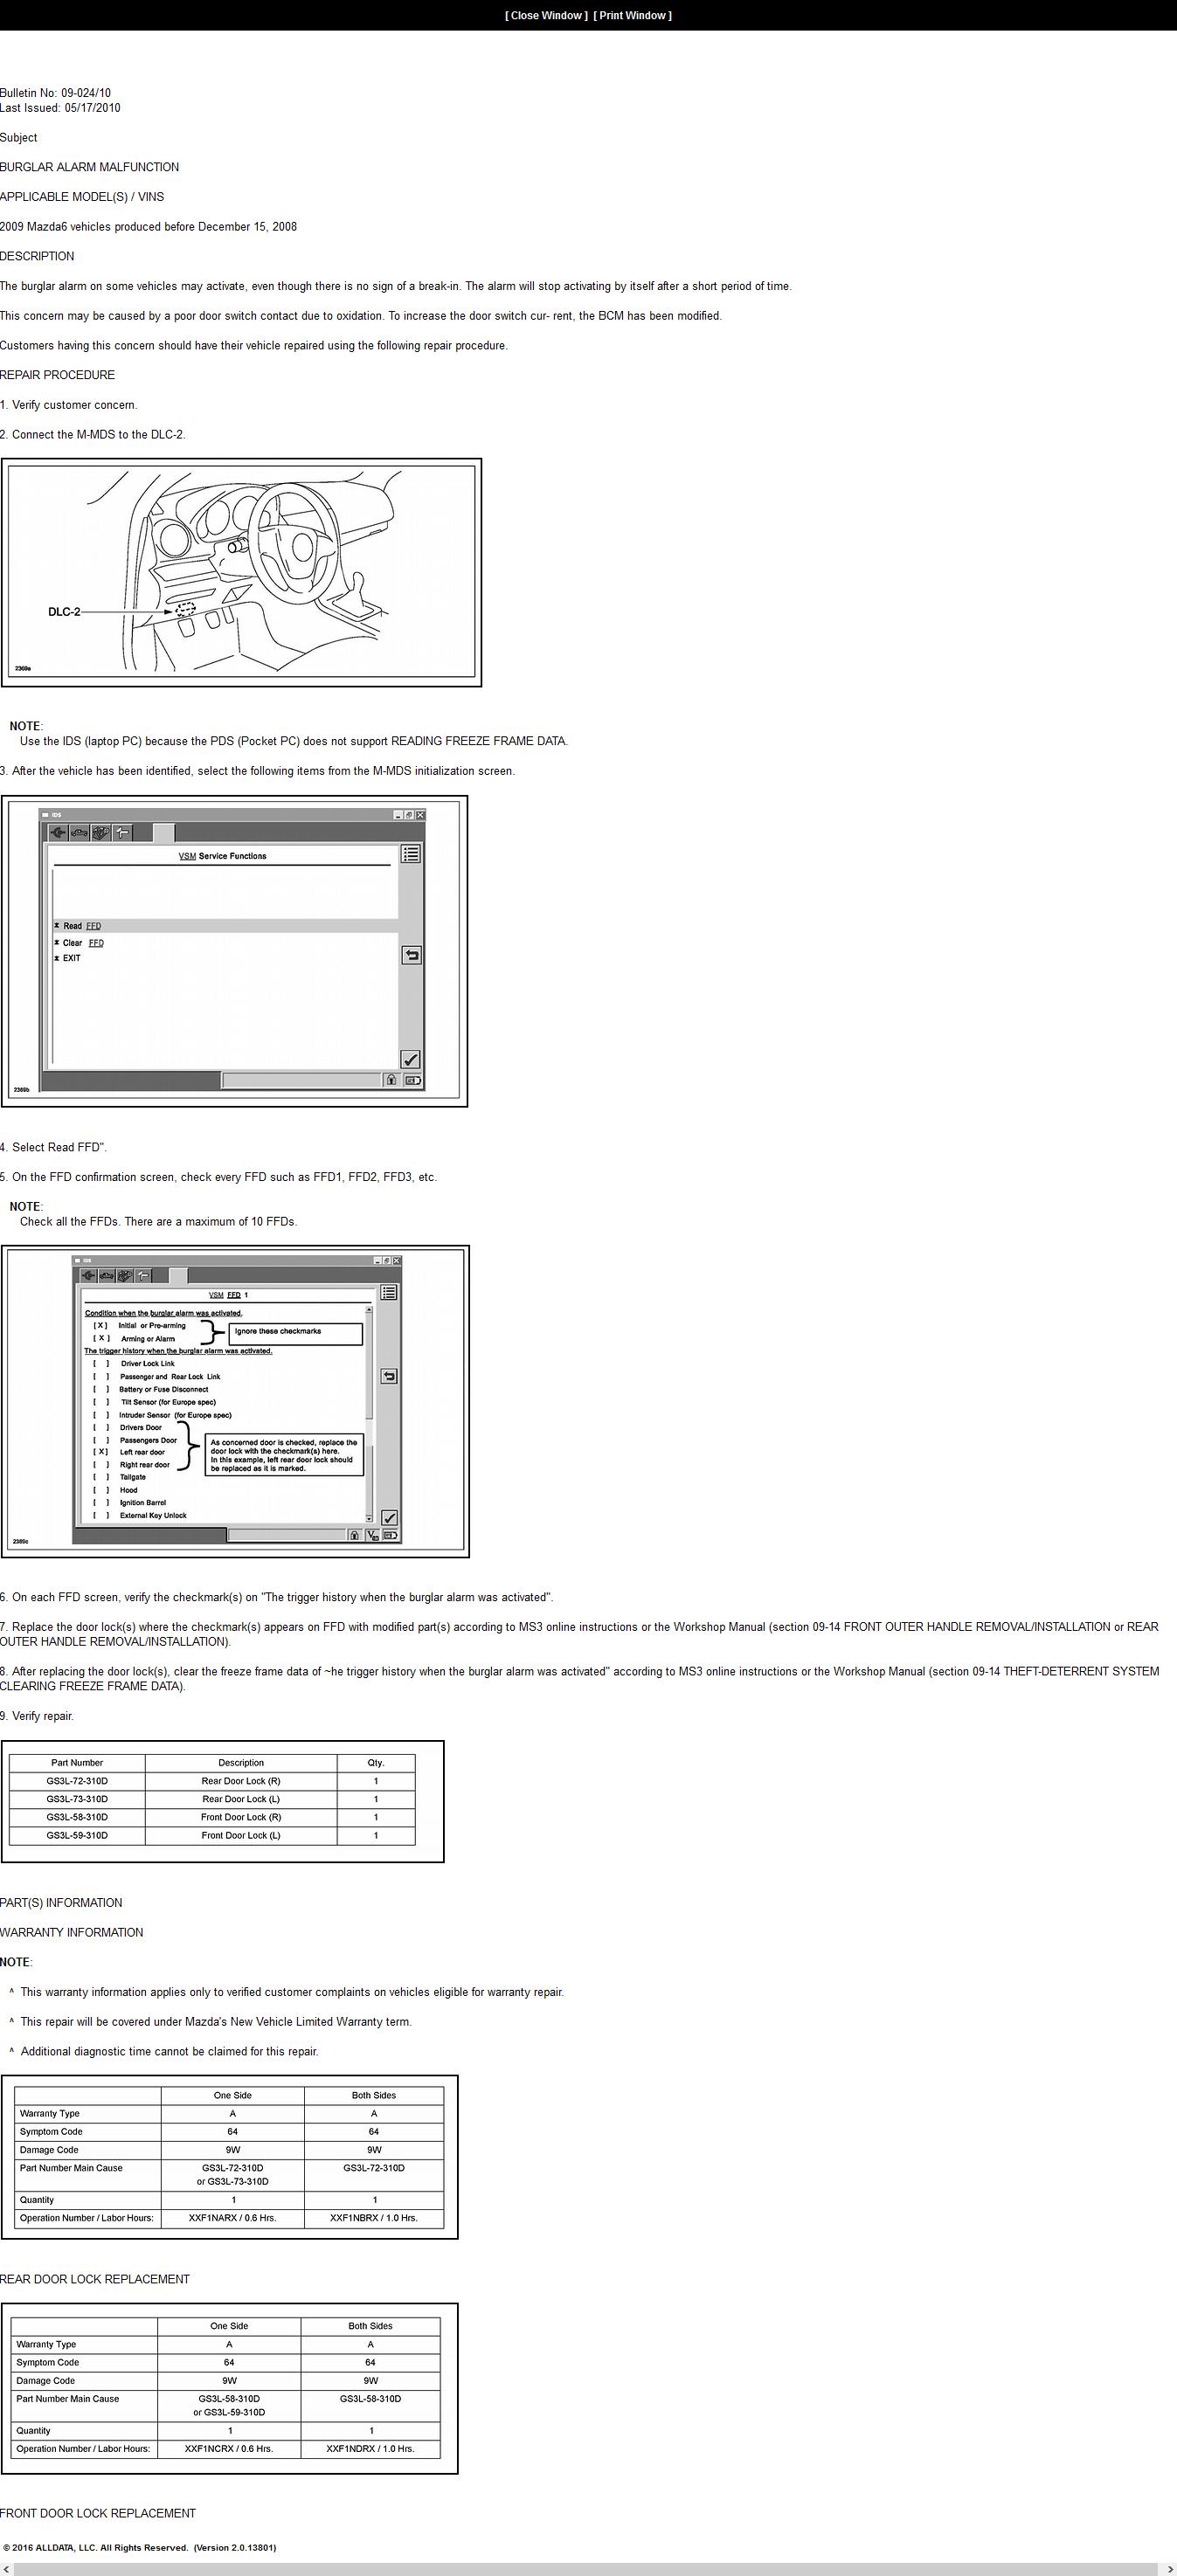 Mazda 3 Service Manual: Theft Deterrent System Reading Freeze Frame Data